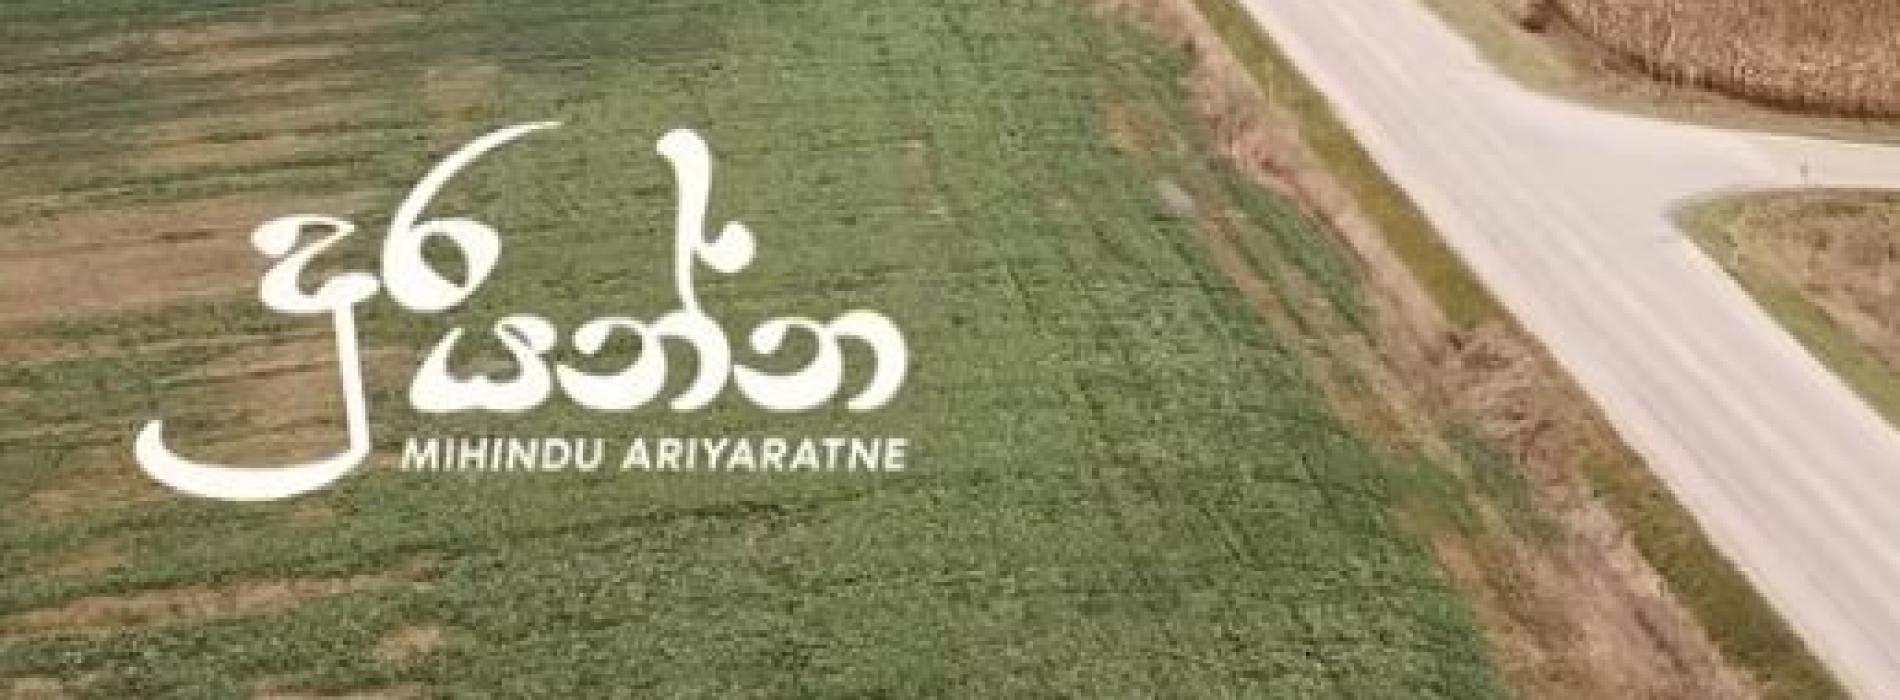 New Music : Mihindu Ariyaratne – දුර යන්න | Dura Yanna (Official Music Video)